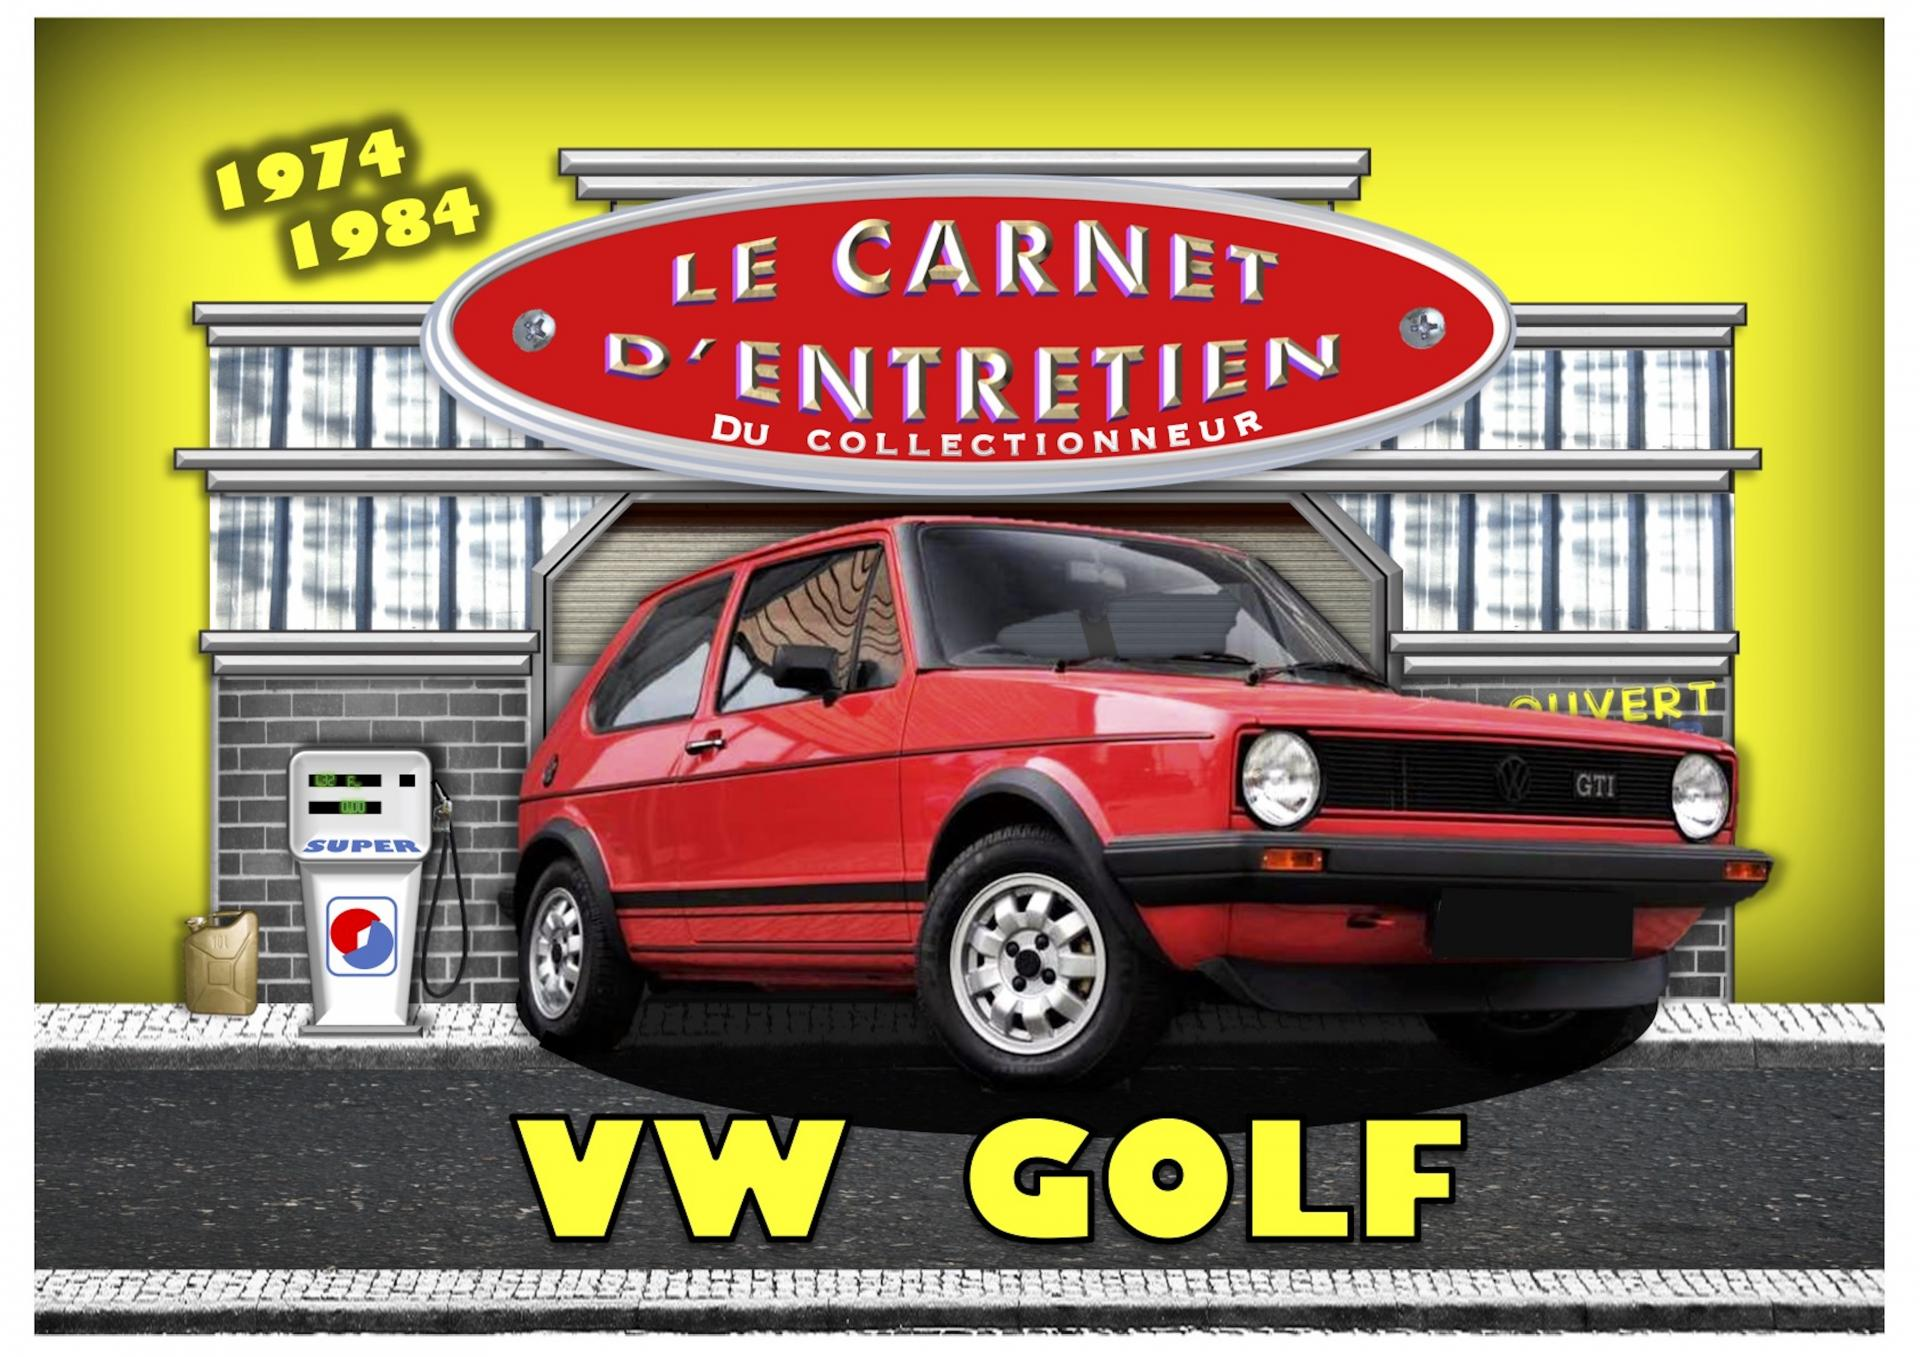 Carnet d'entretien Volkswagen golf